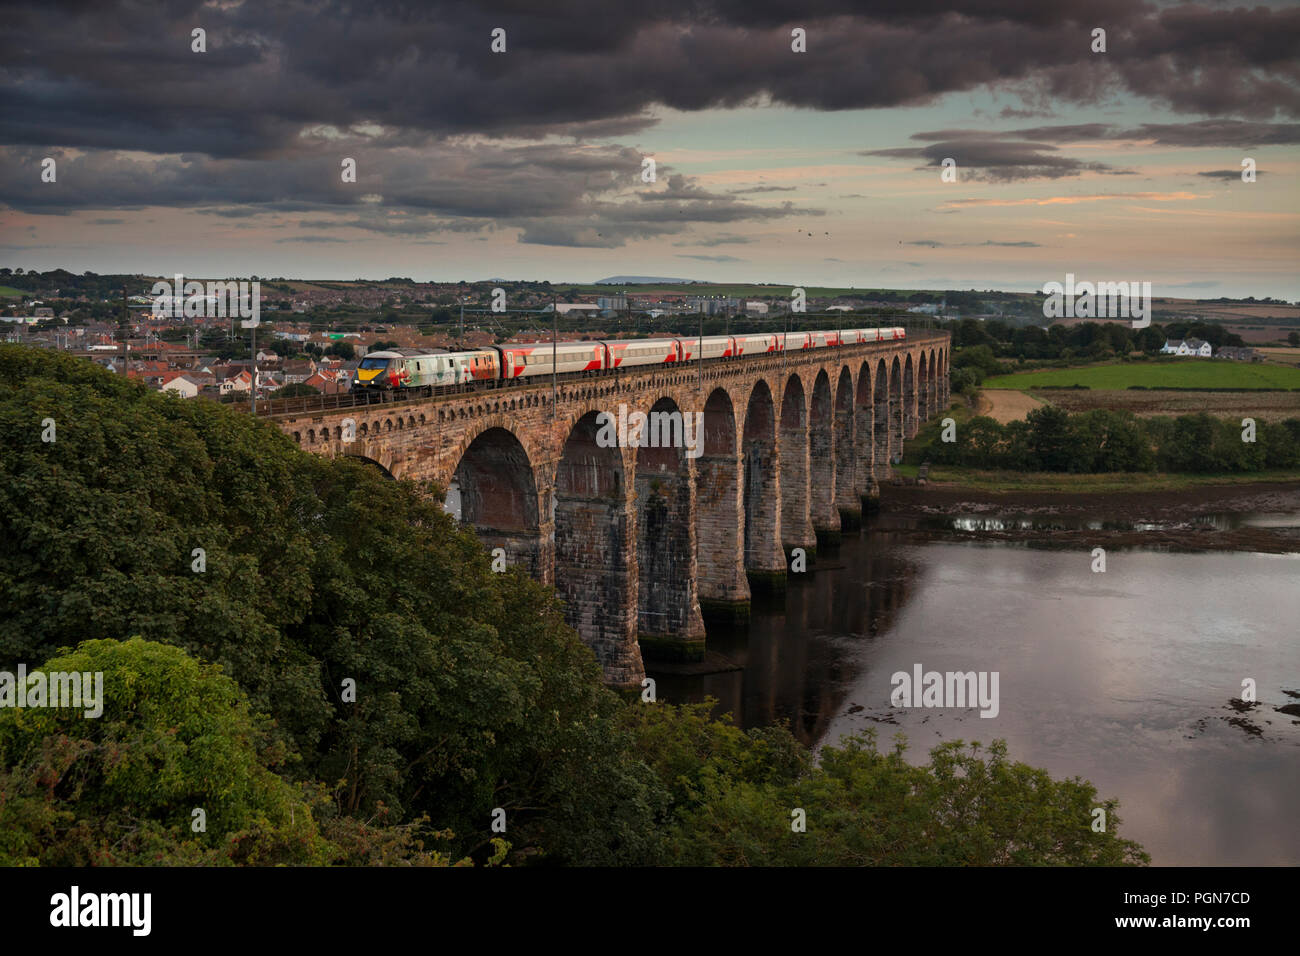 London North Eastern railway  ( LNER ) class 91 locomotive 91111 For the Fallen crossing the Royal border bridge, Berwick upon Tweed - Stock Image